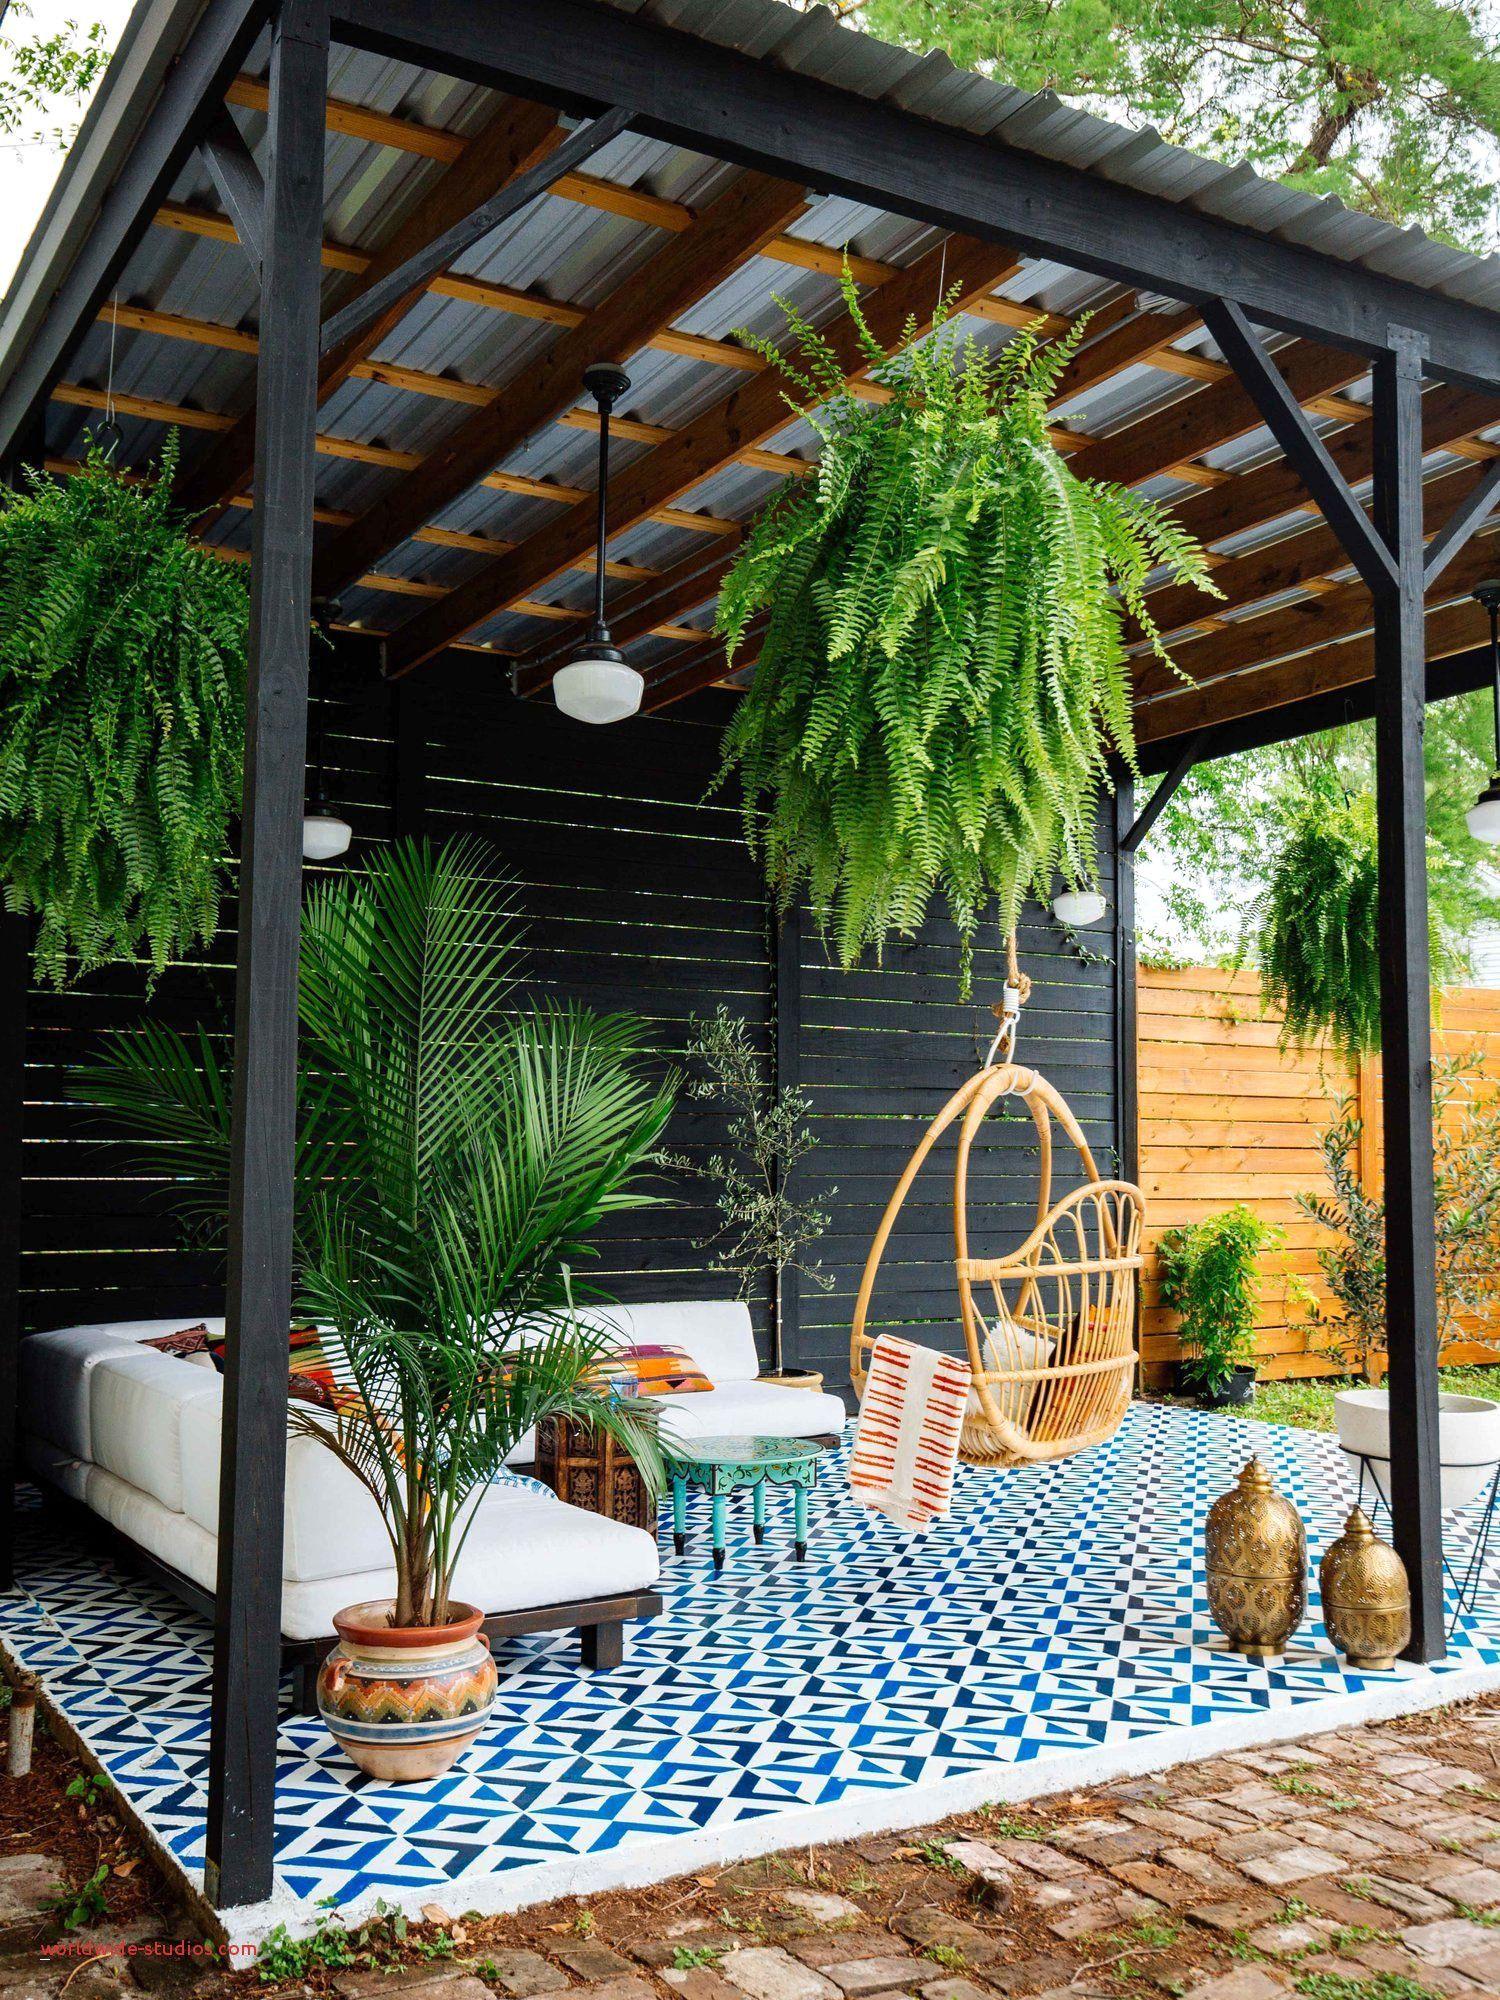 Diy Hot Tub Privacy Screen Hot Tub Shelter Plans Gazebo Kit Garden